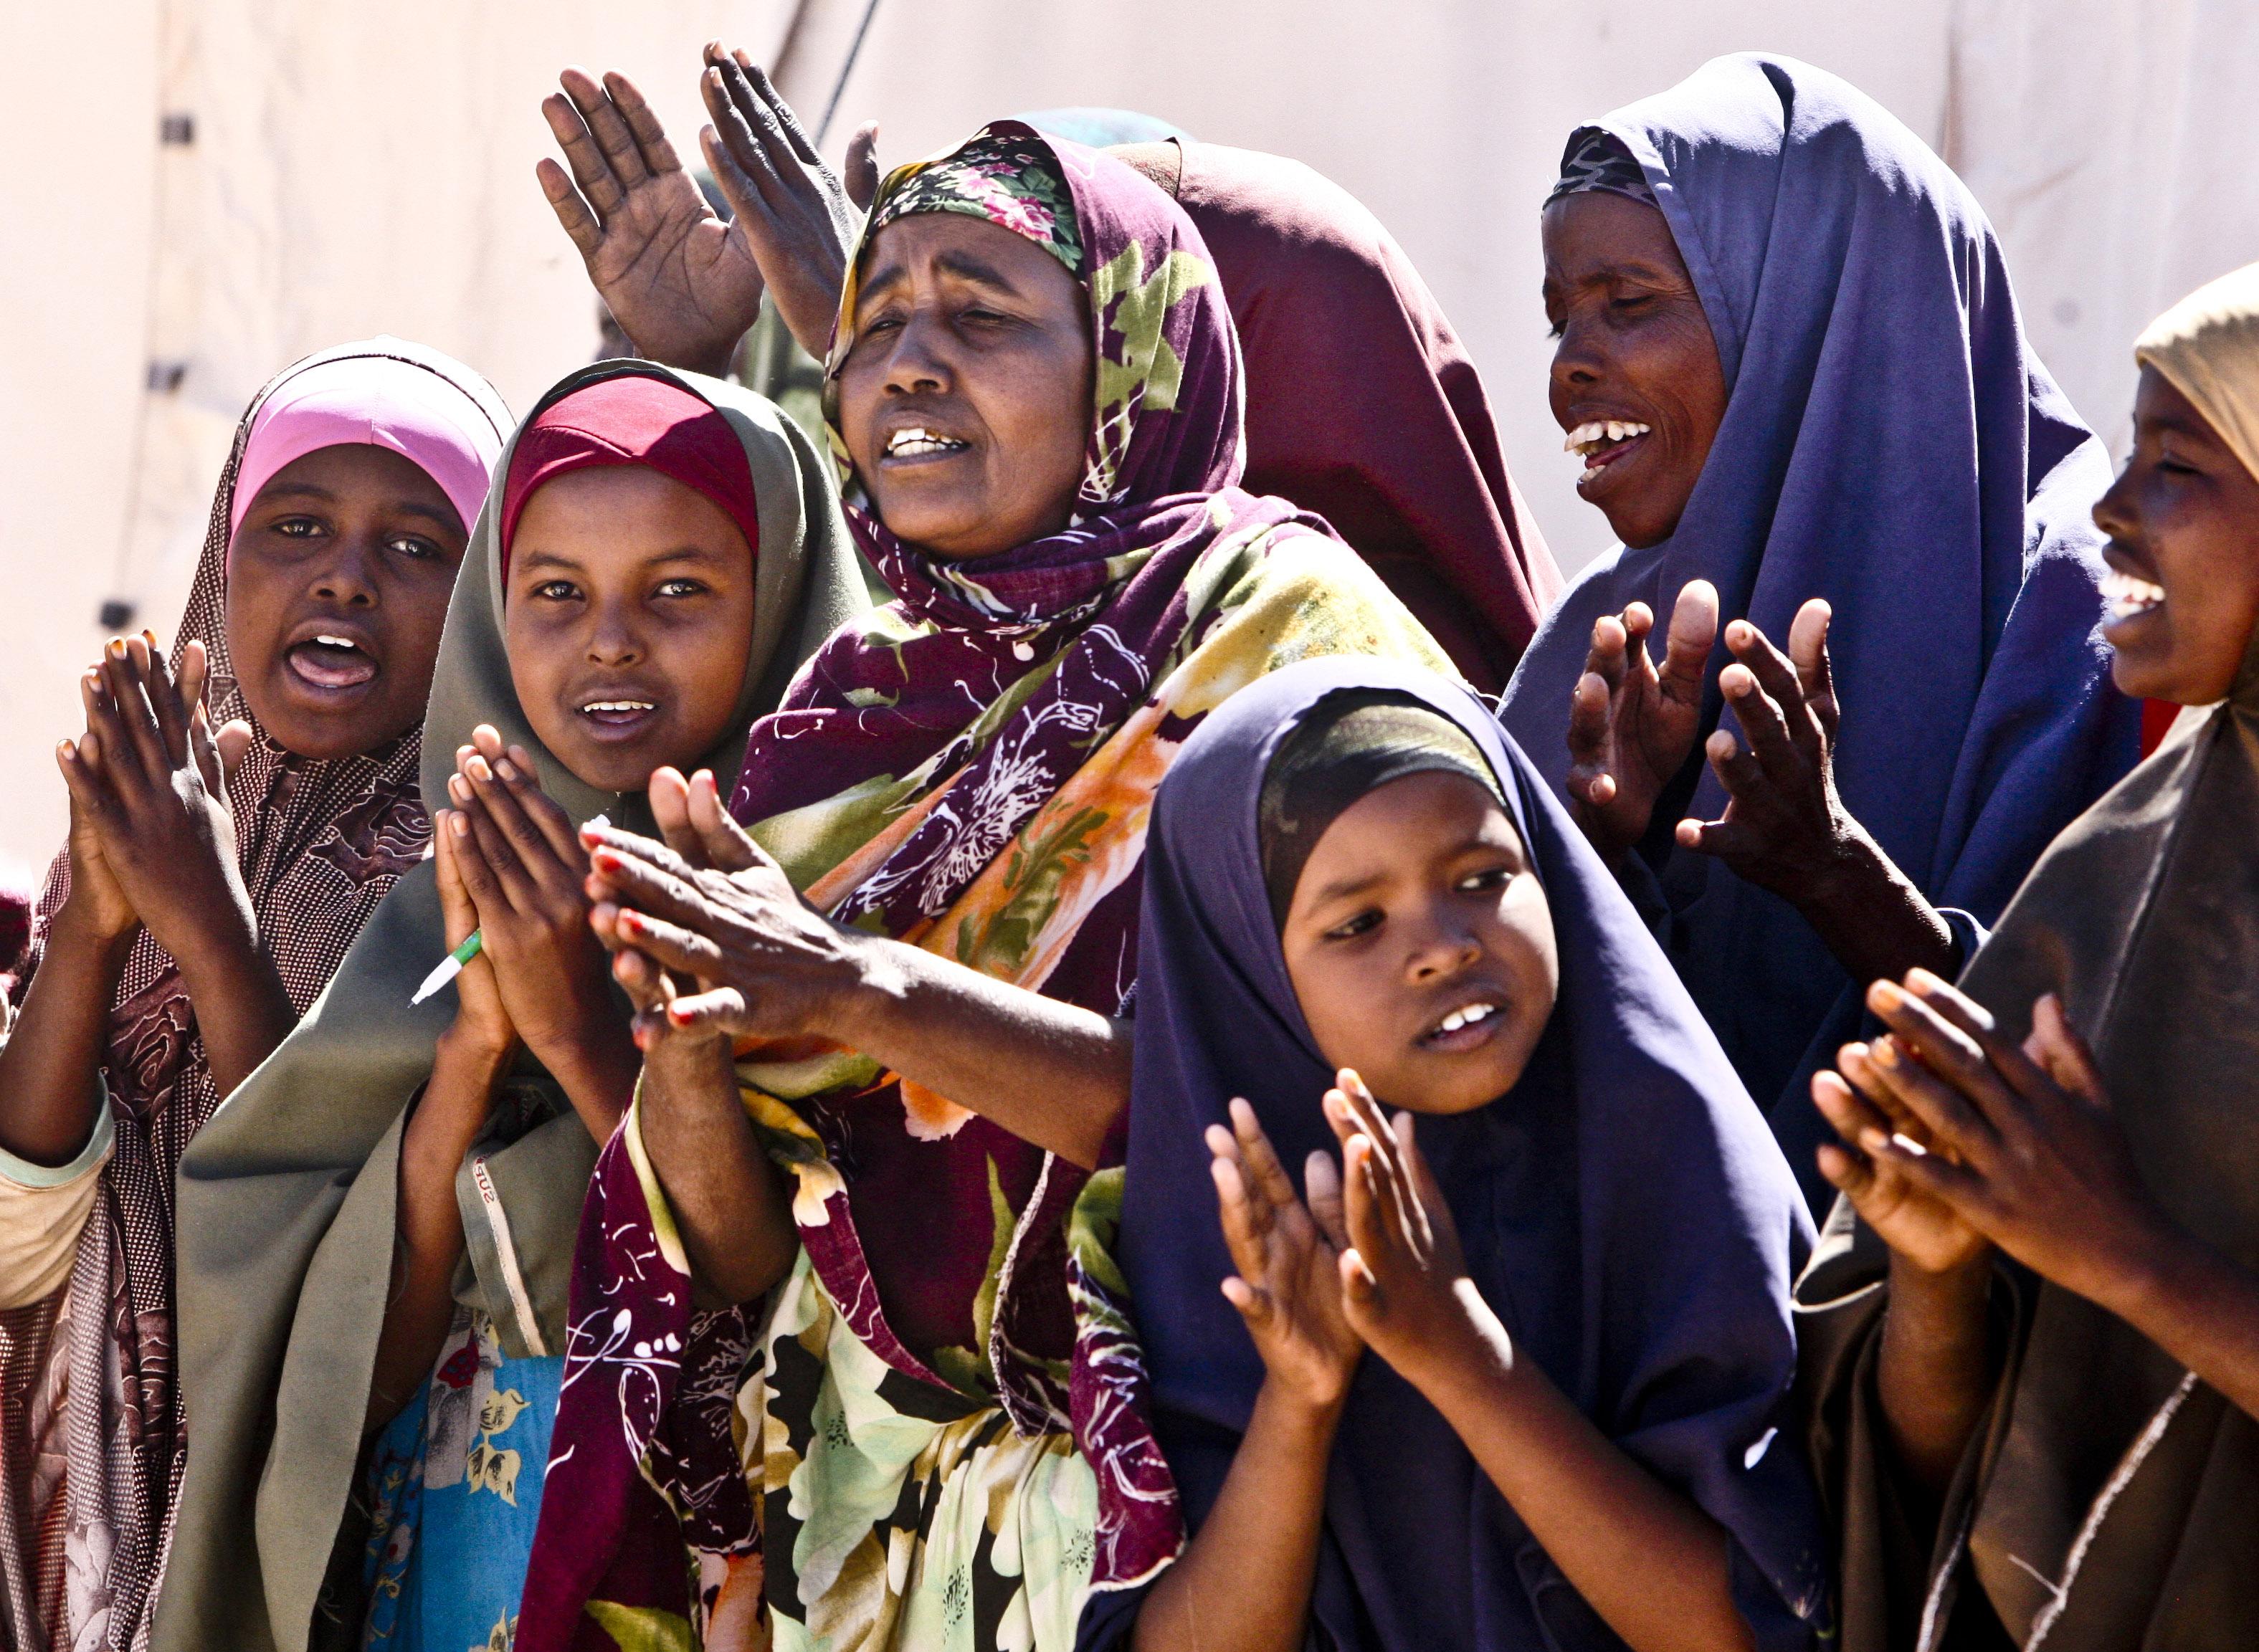 https://i1.wp.com/globalfirstresponder.com/wp-content/gallery/somalia/idpsgreetusg-somalia.jpg